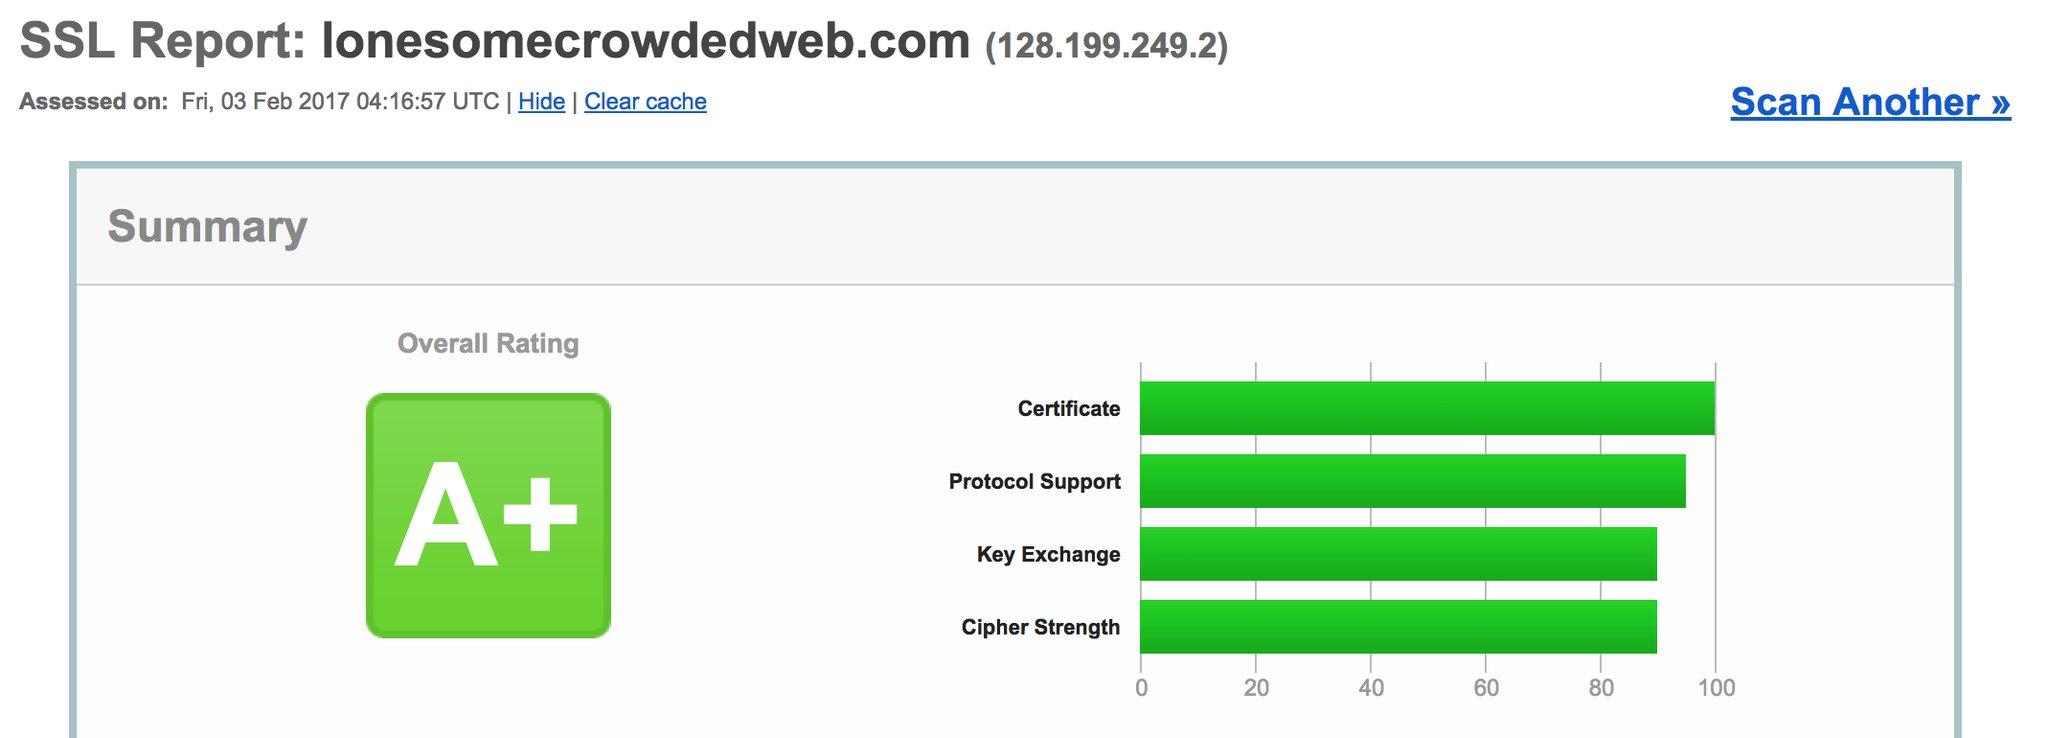 lonesomecrowdedweb.com A+ Qualsys SSL Server Test rating